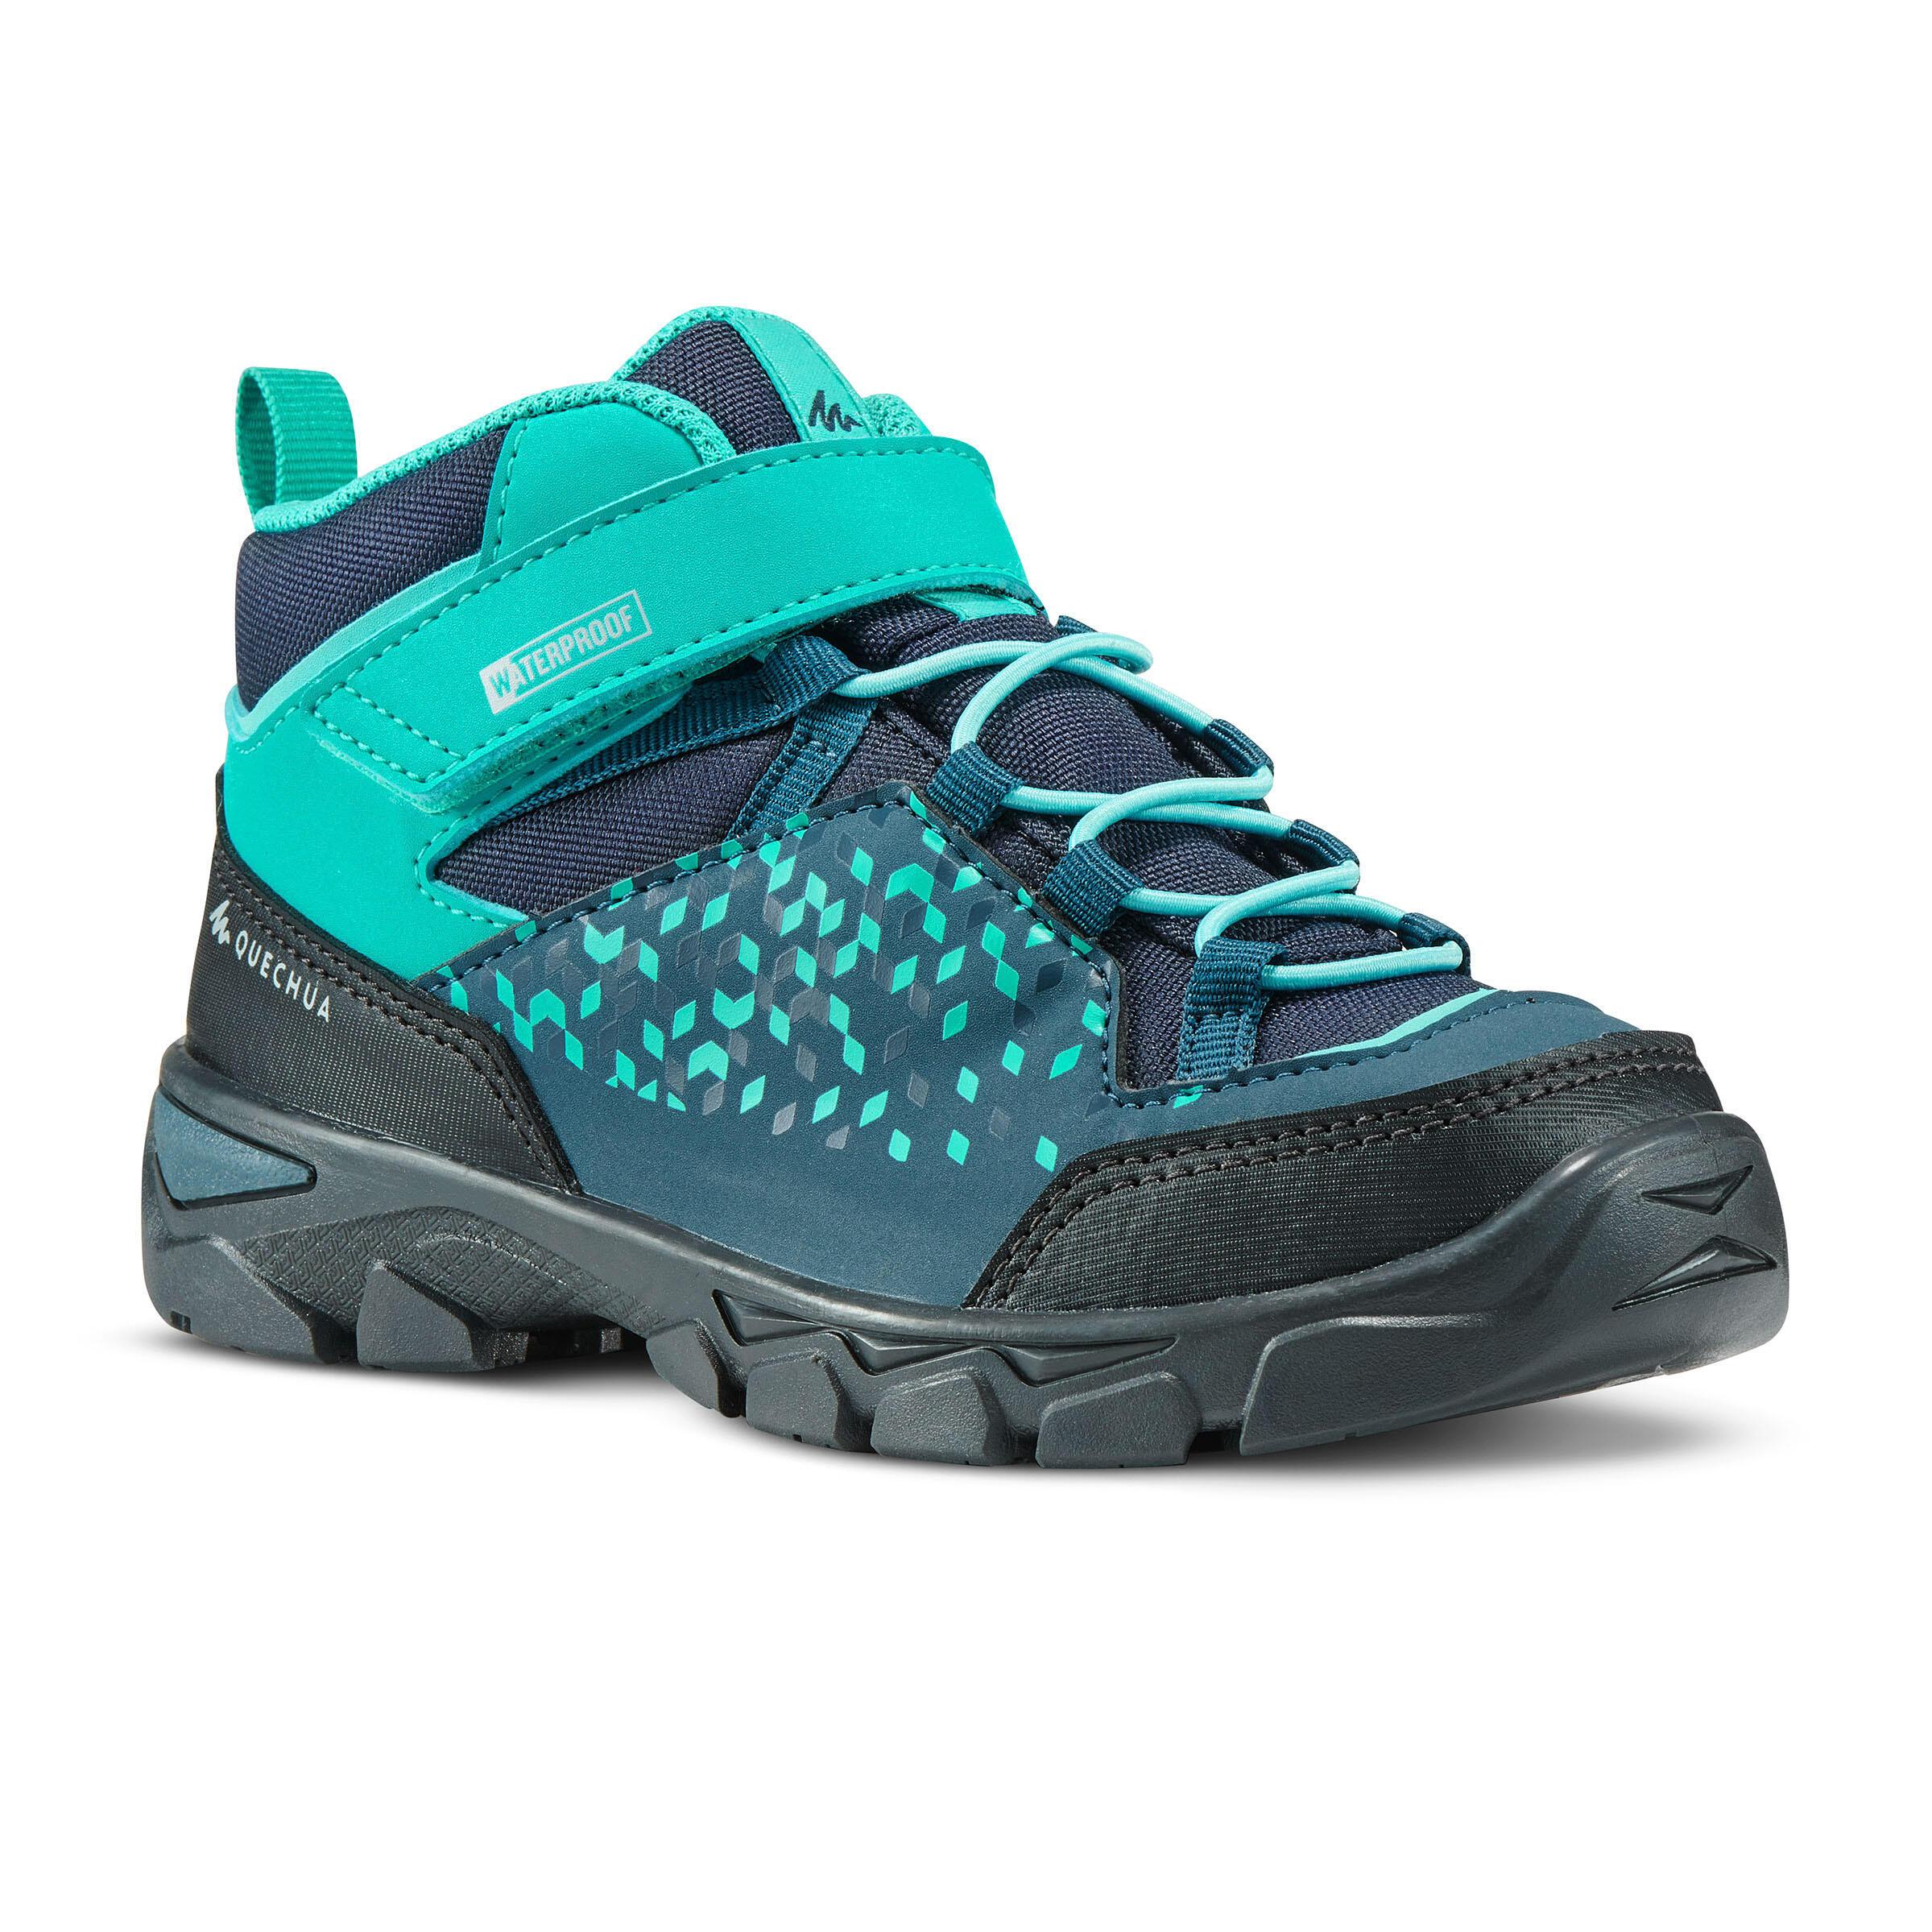 Kids' Waterproof Hiking Shoes - MH120